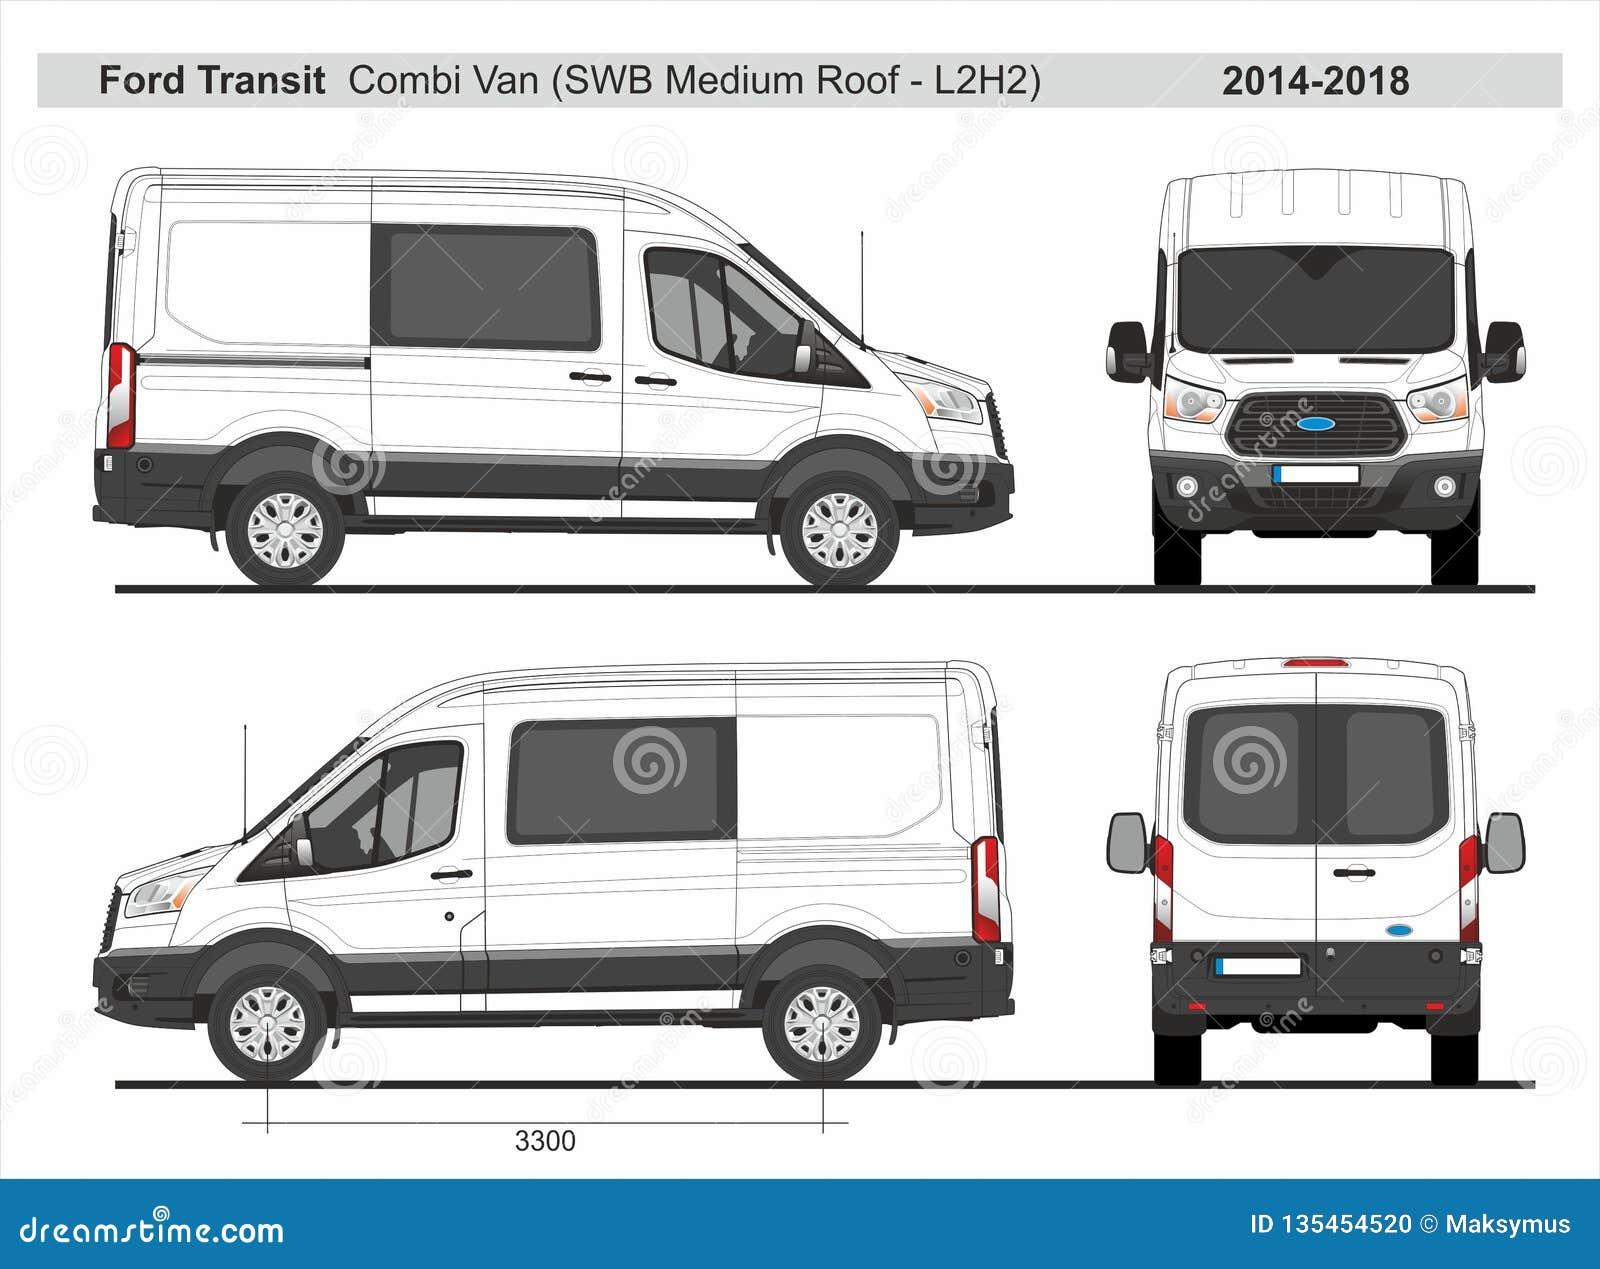 Ford Transit Combi Van Swb Medium Roof L2h2 2014 2018 Editorial Image Illustration Of Transit Wraps 135454520